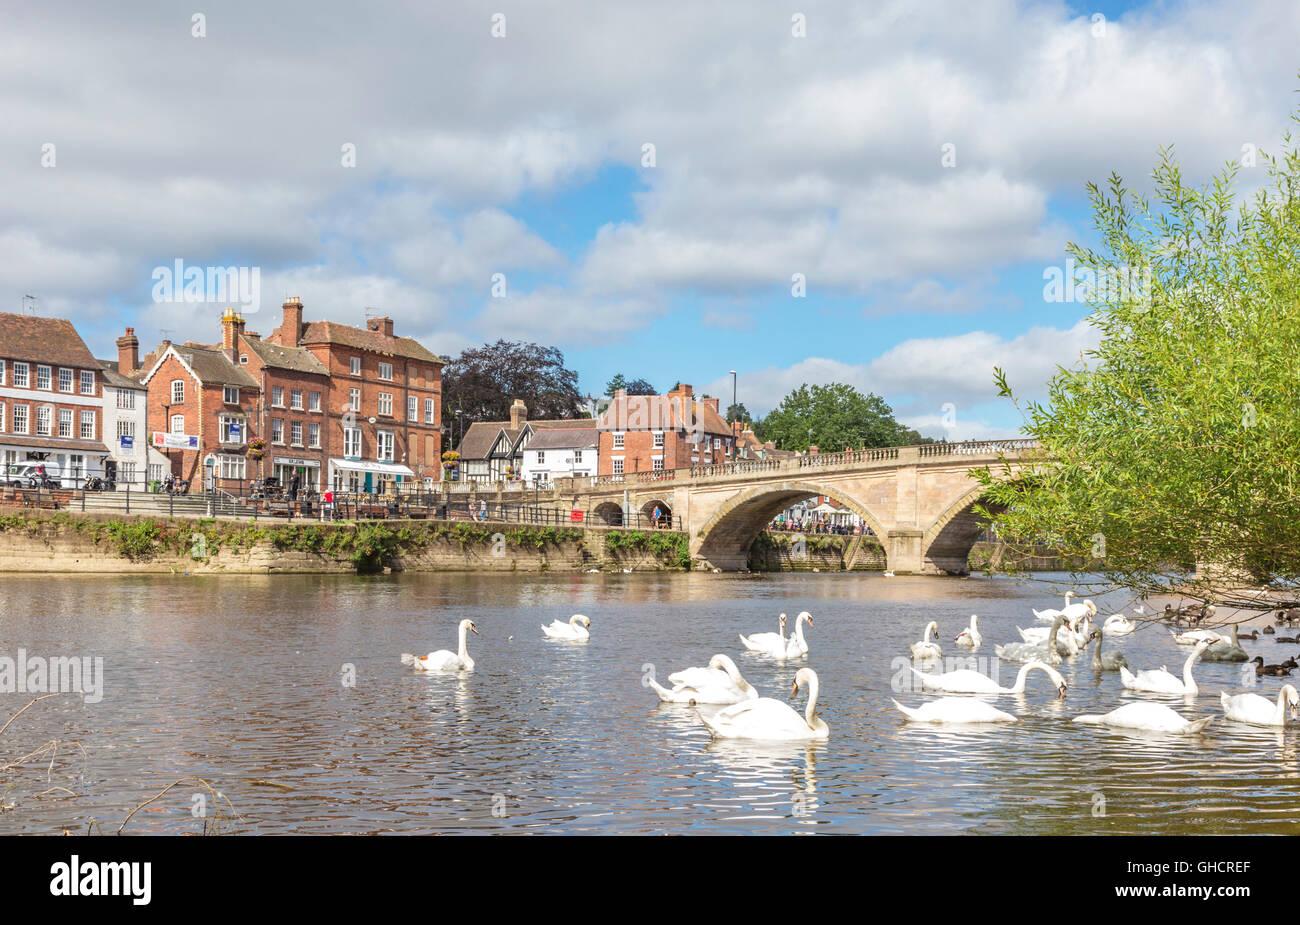 Die am Fluss Stadt Bewdley, Worcestershire, England, UK Stockbild